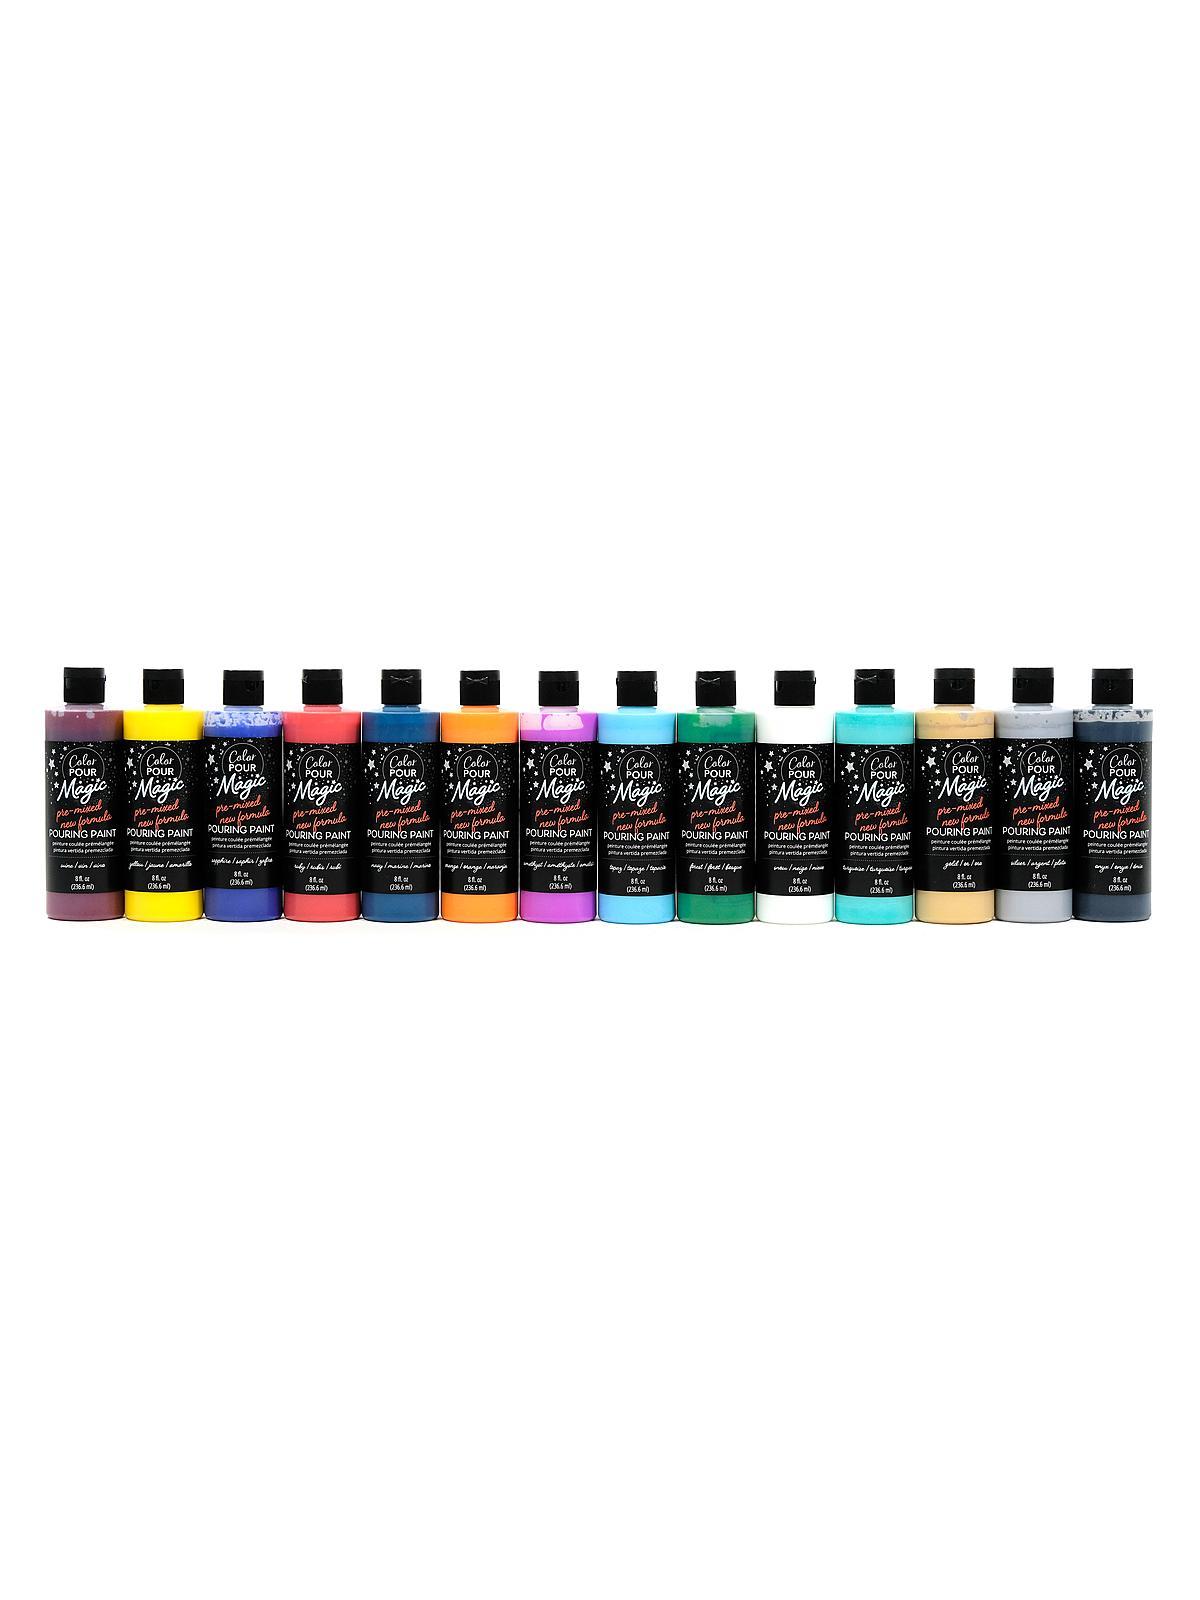 American Crafts - Color Pour Magic Pre-Mixed Pouring Paint